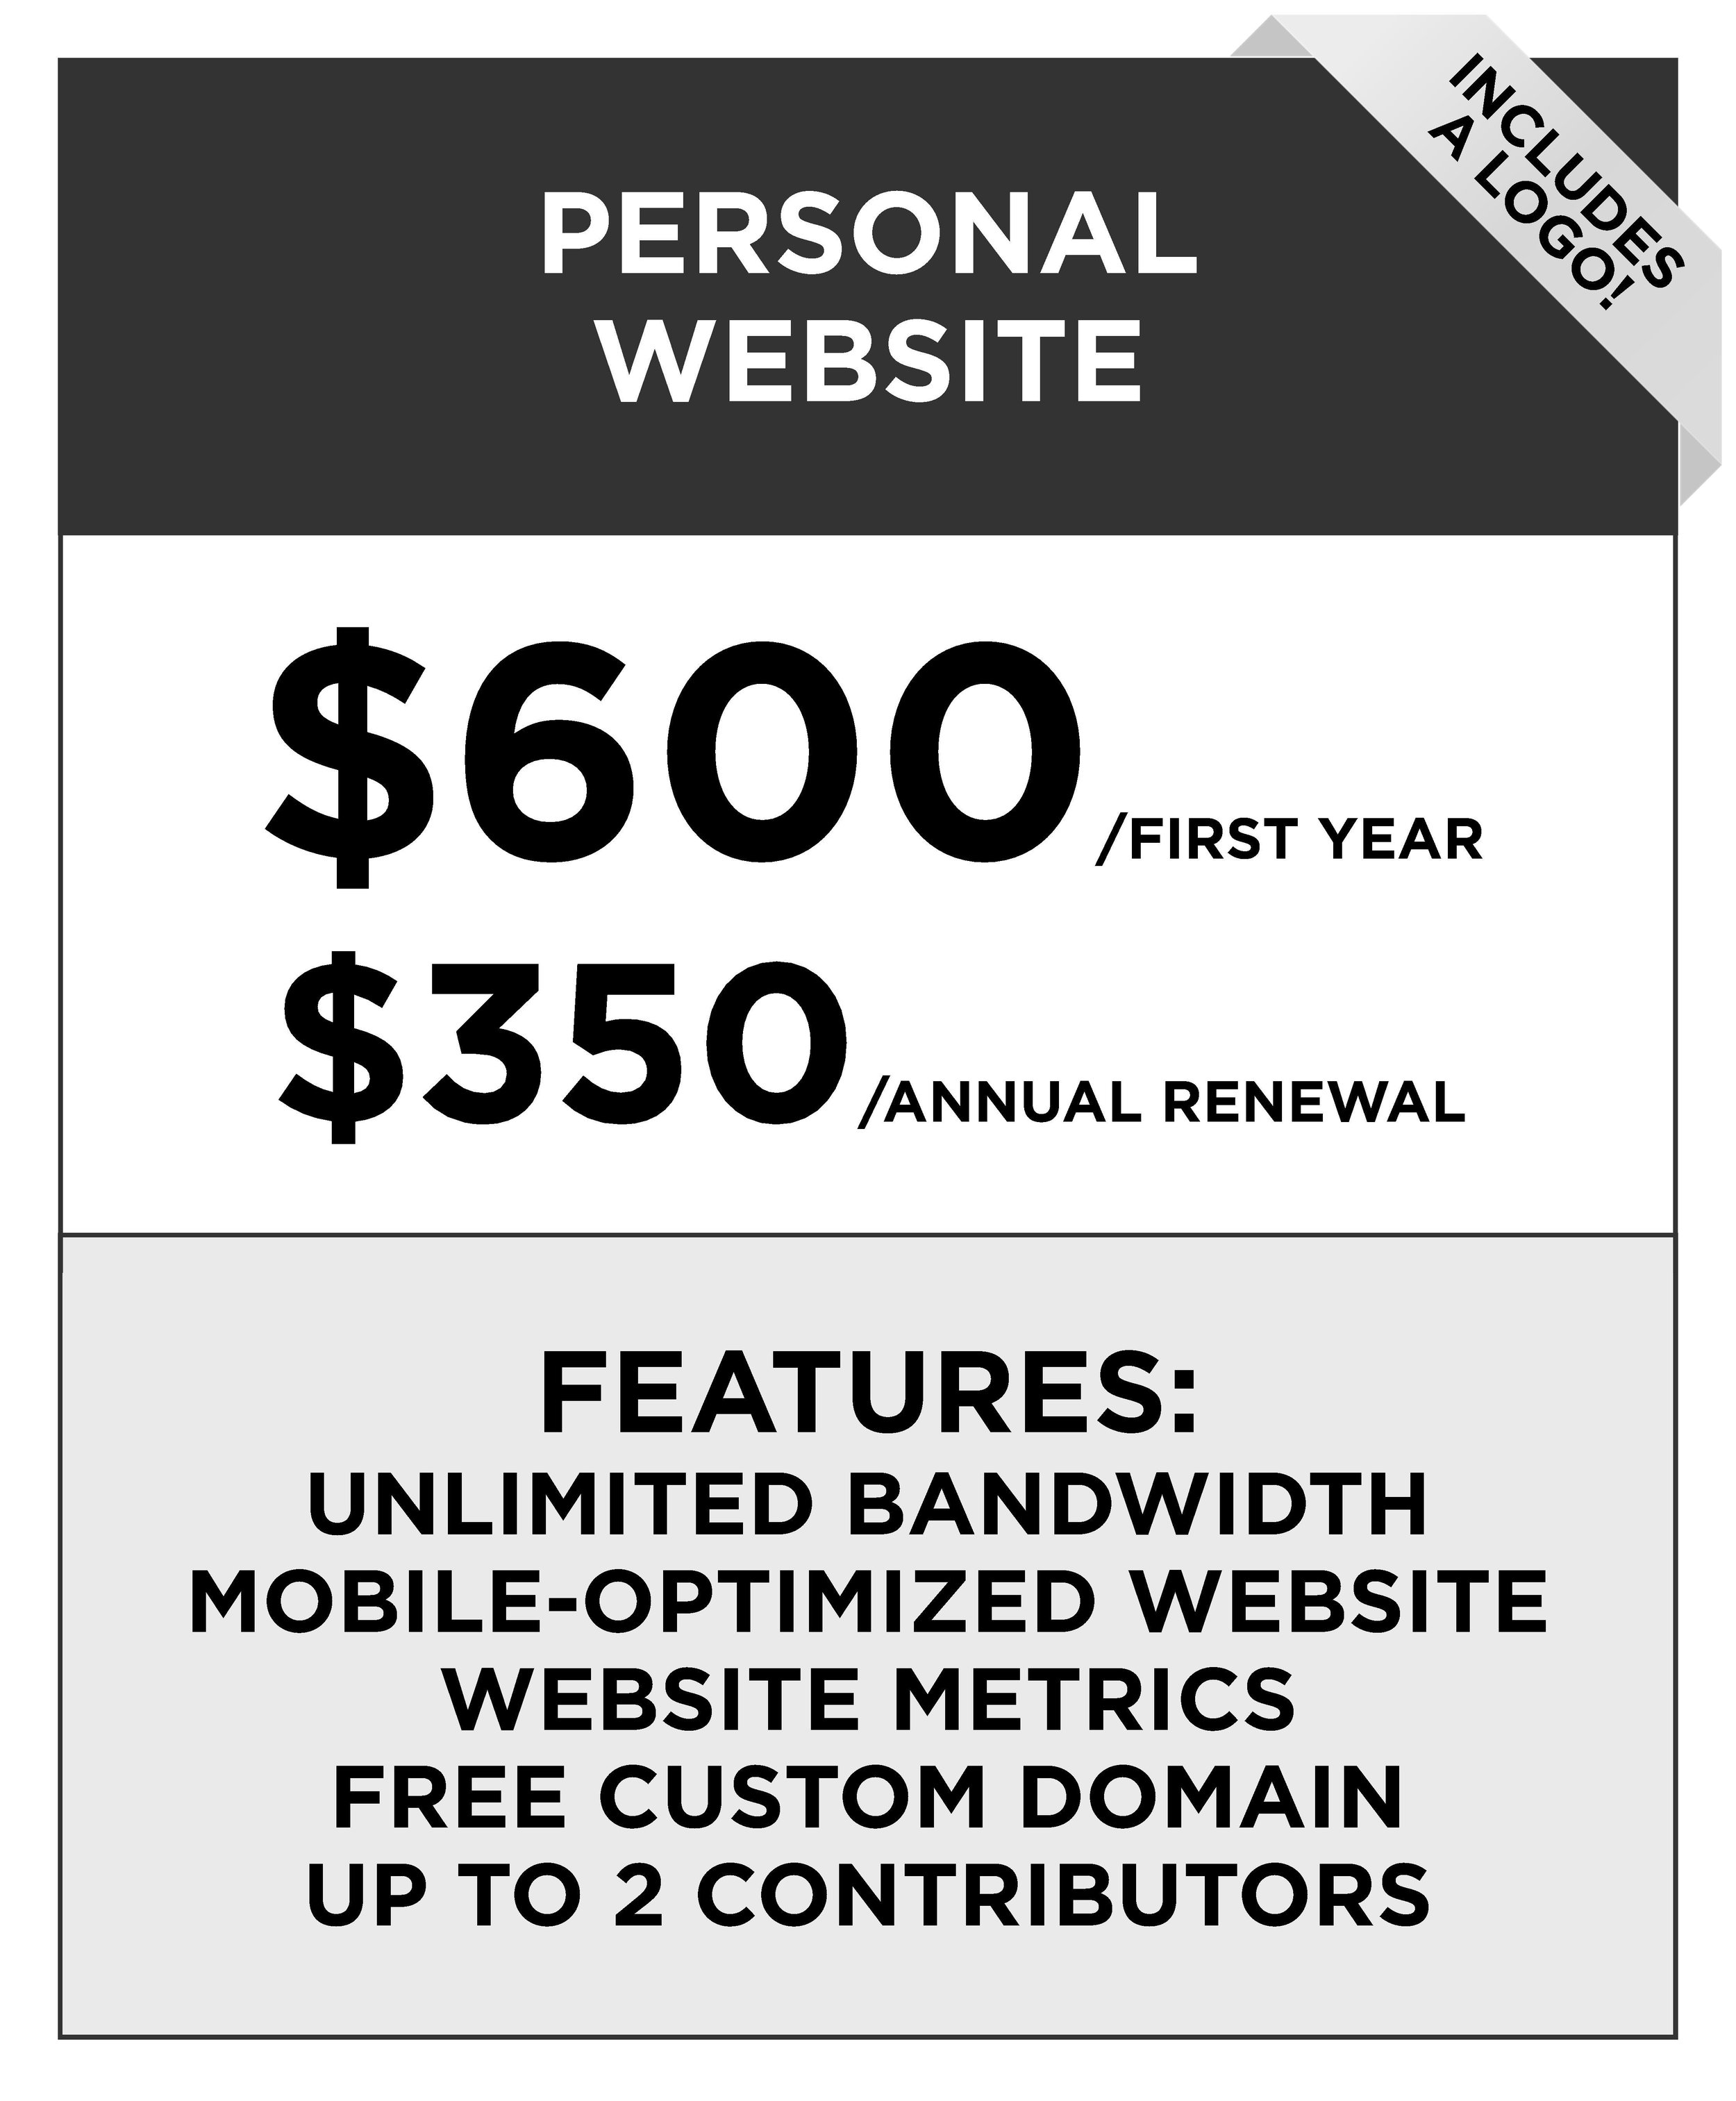 webdesign-personal.jpg